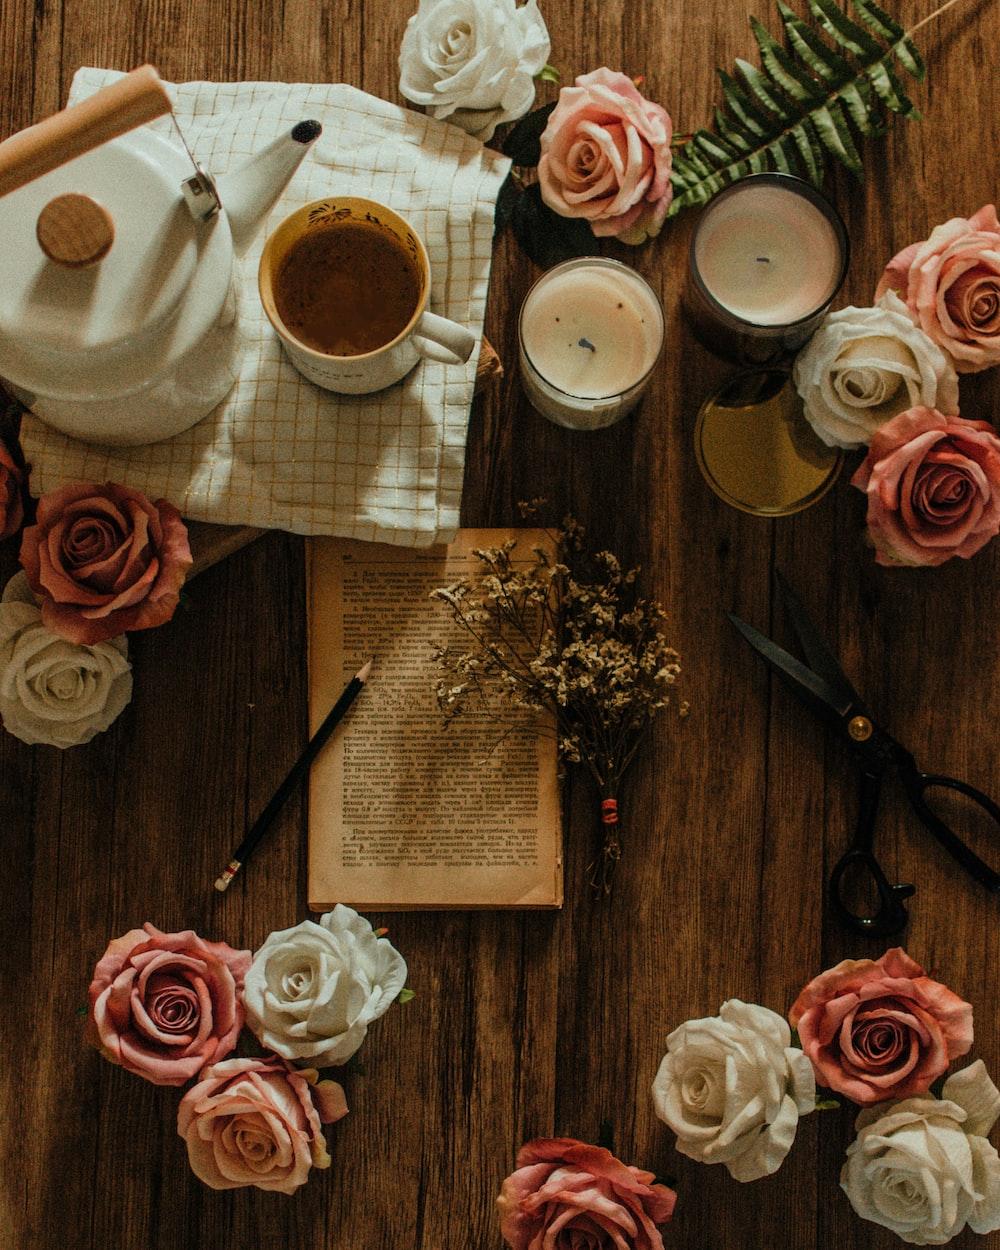 pink and white roses near white ceramic mug on table